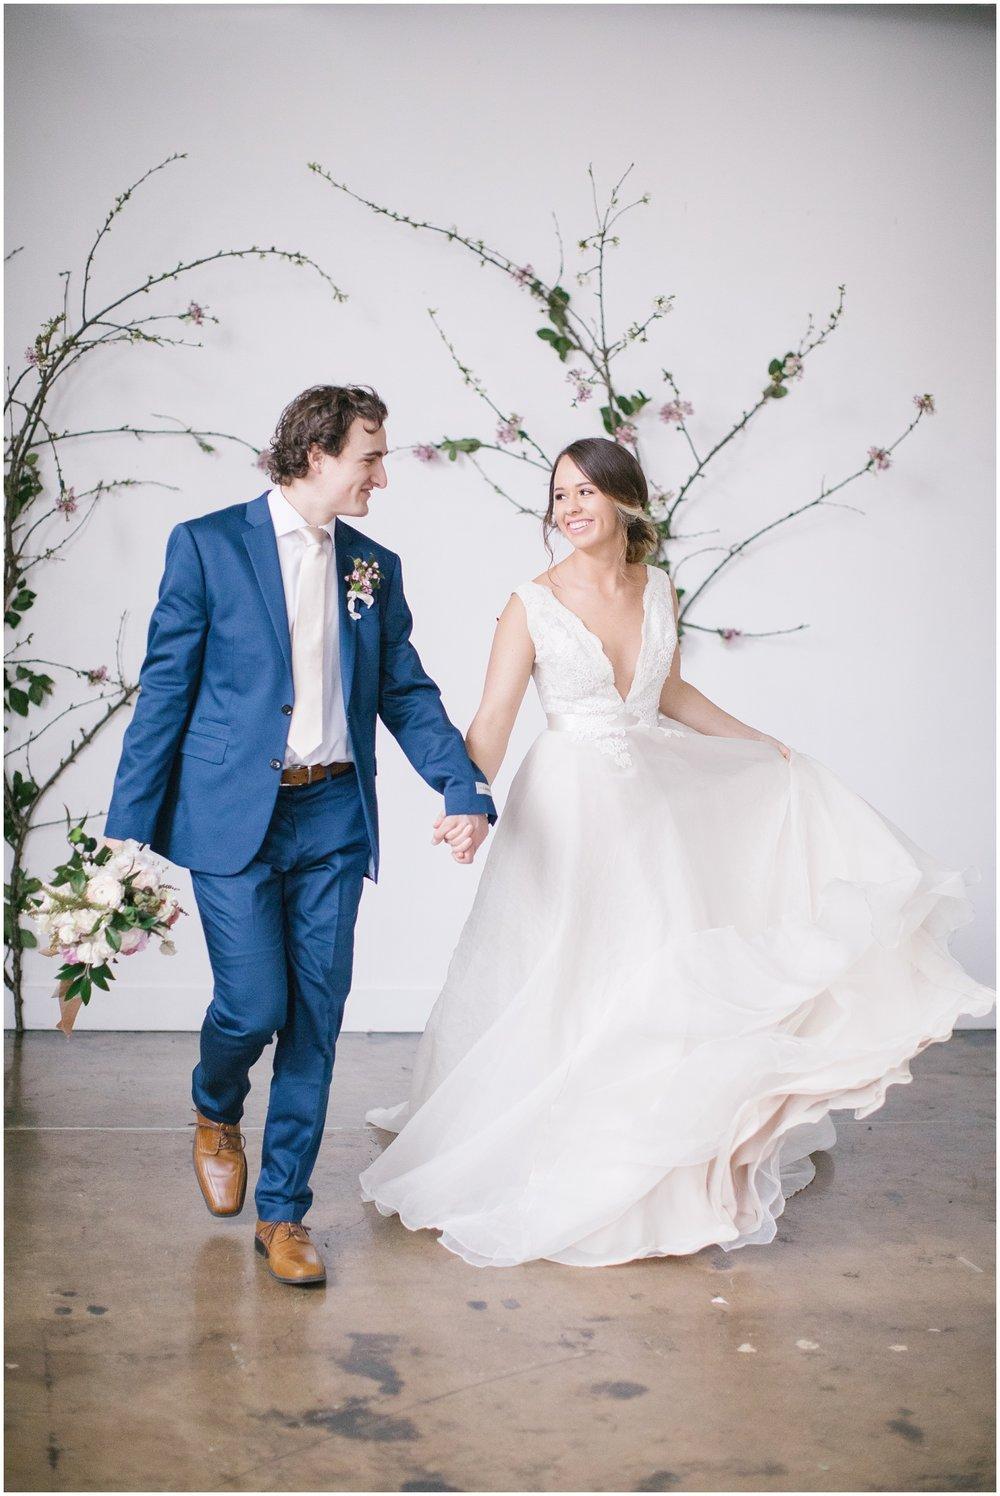 Styled Shoot2-17-45_Lizzie-B-Imagery-Utah-Wedding-Photographer-Park-City-Salt-Lake-City-Charcoal-Loft-Studio.jpg